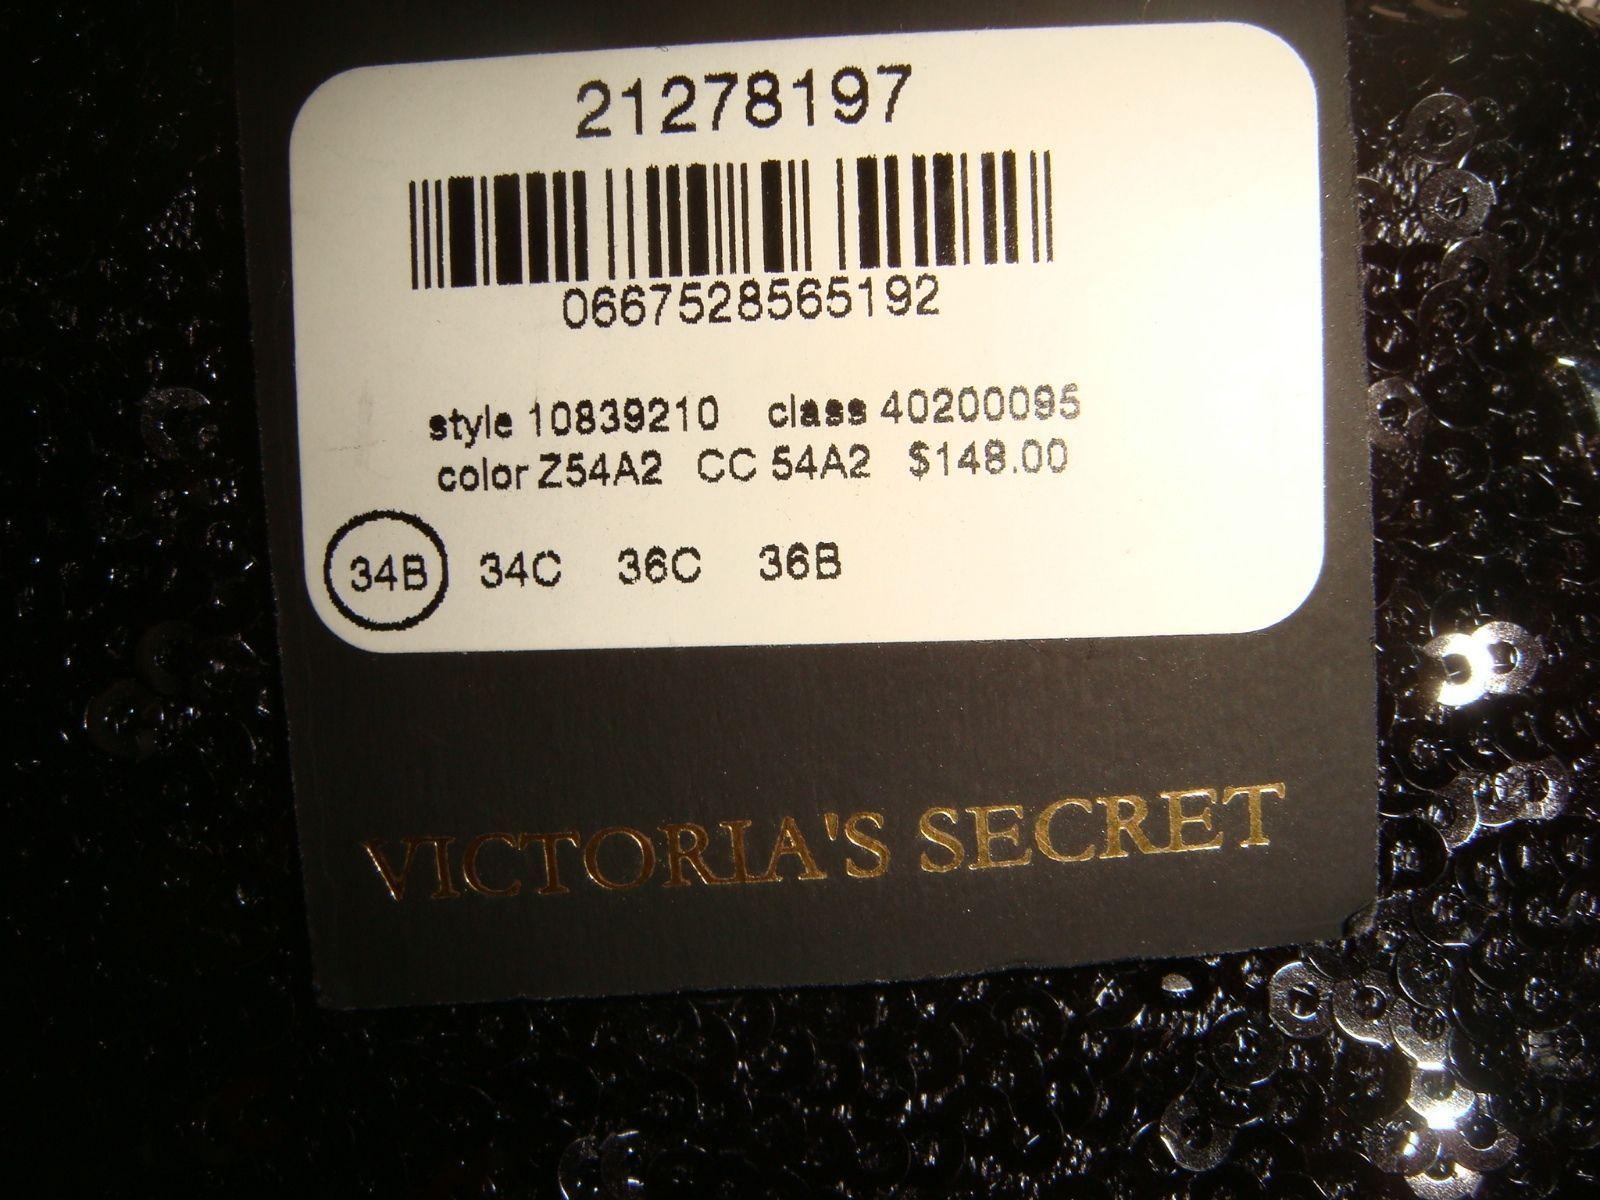 Victoria's Secret DESIGNER COLLECTION Pleasure State 34B BRA SET+CLUTCH Black